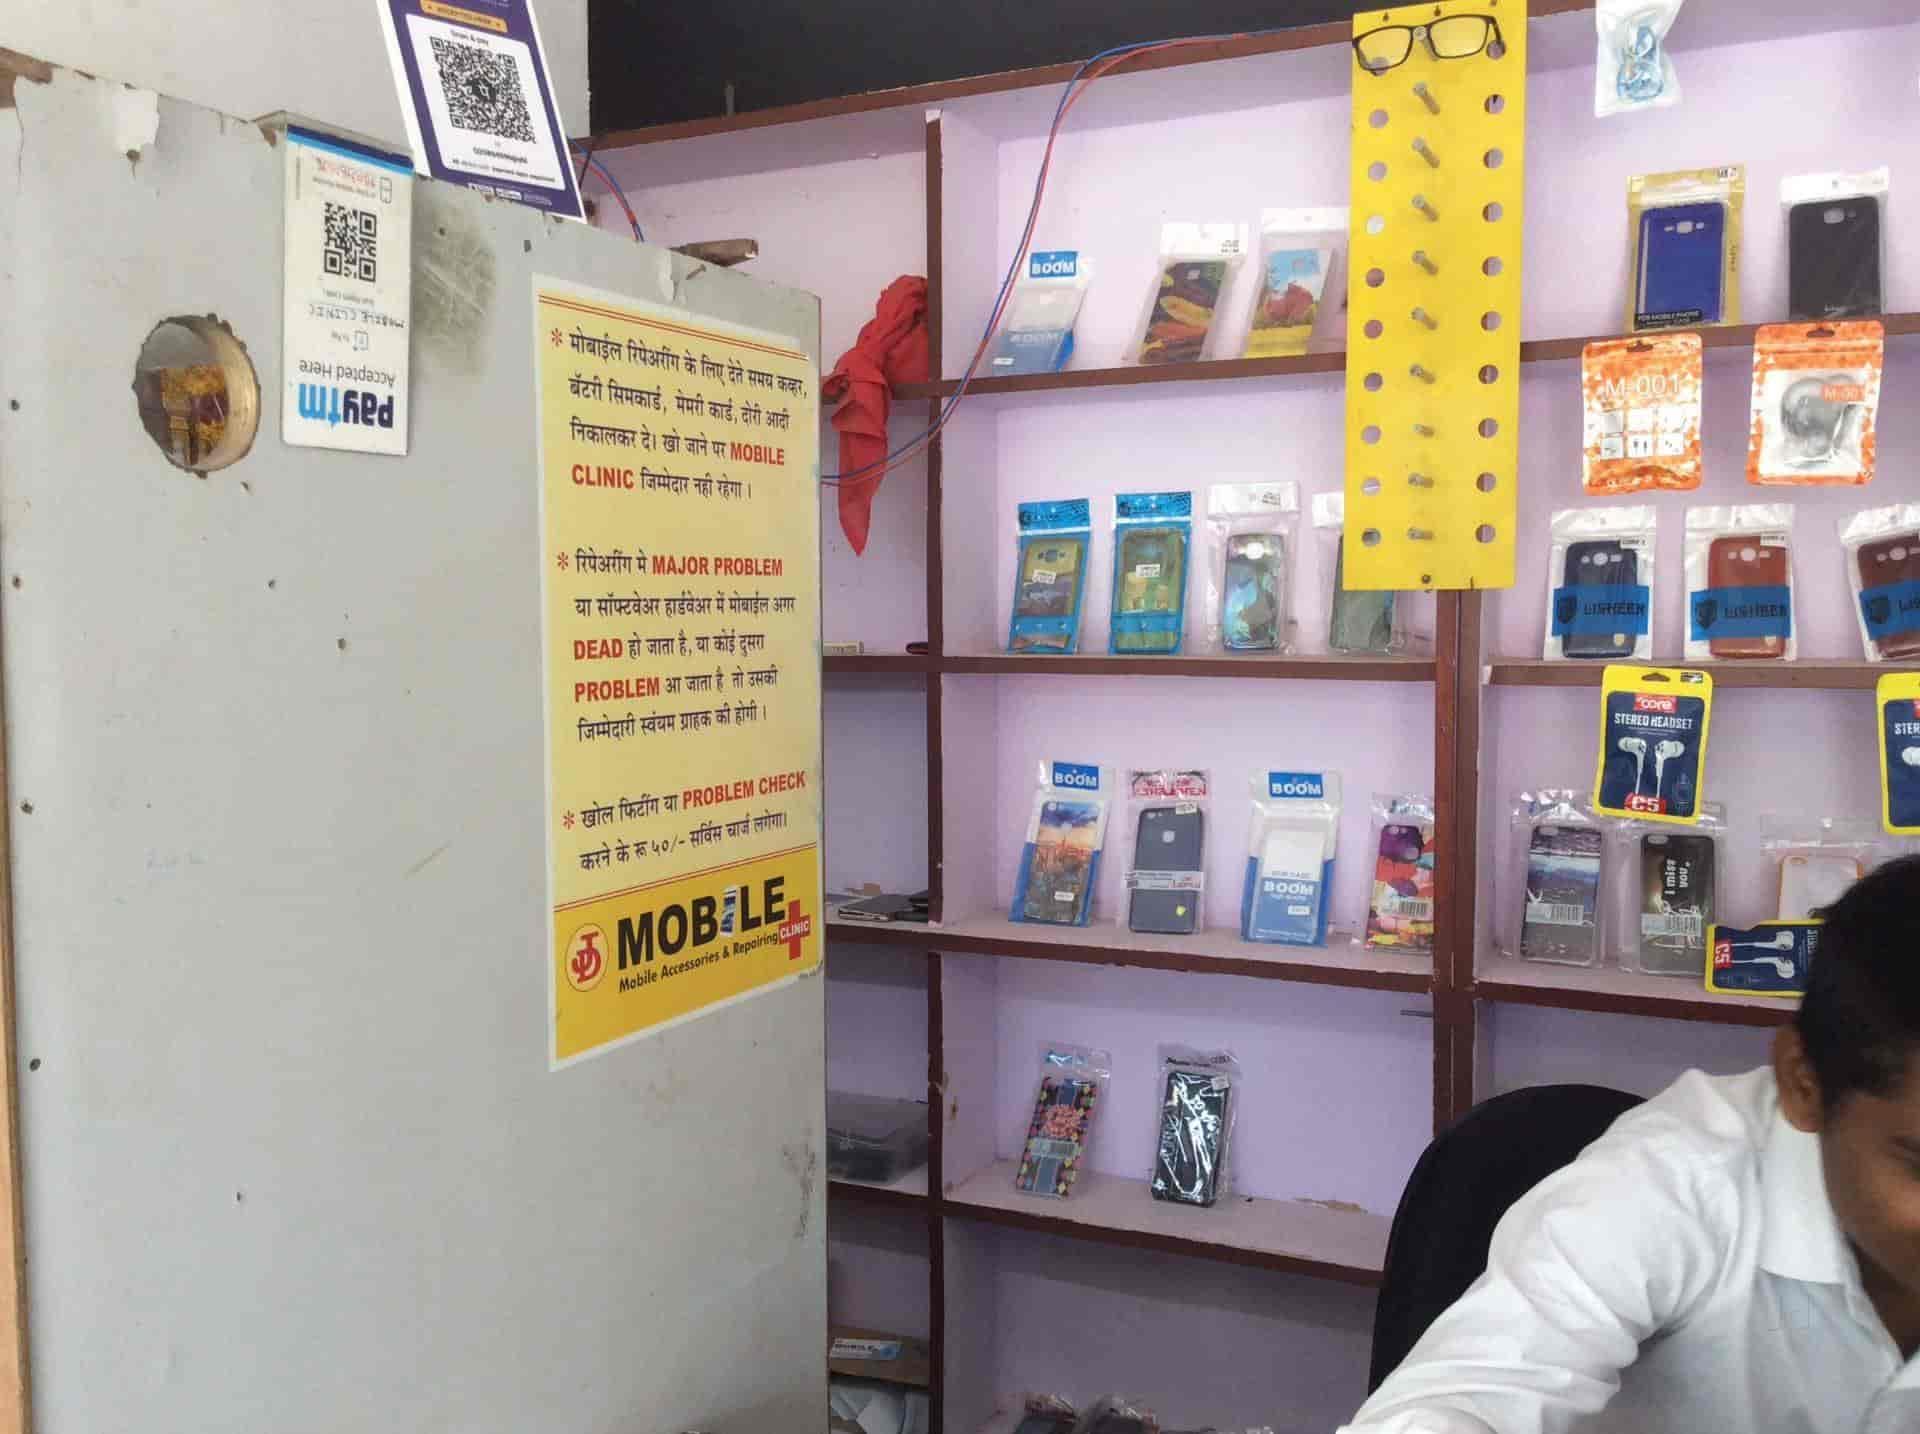 Mobile Clinic, Garkheda - Mobile Phone Repair & Services in